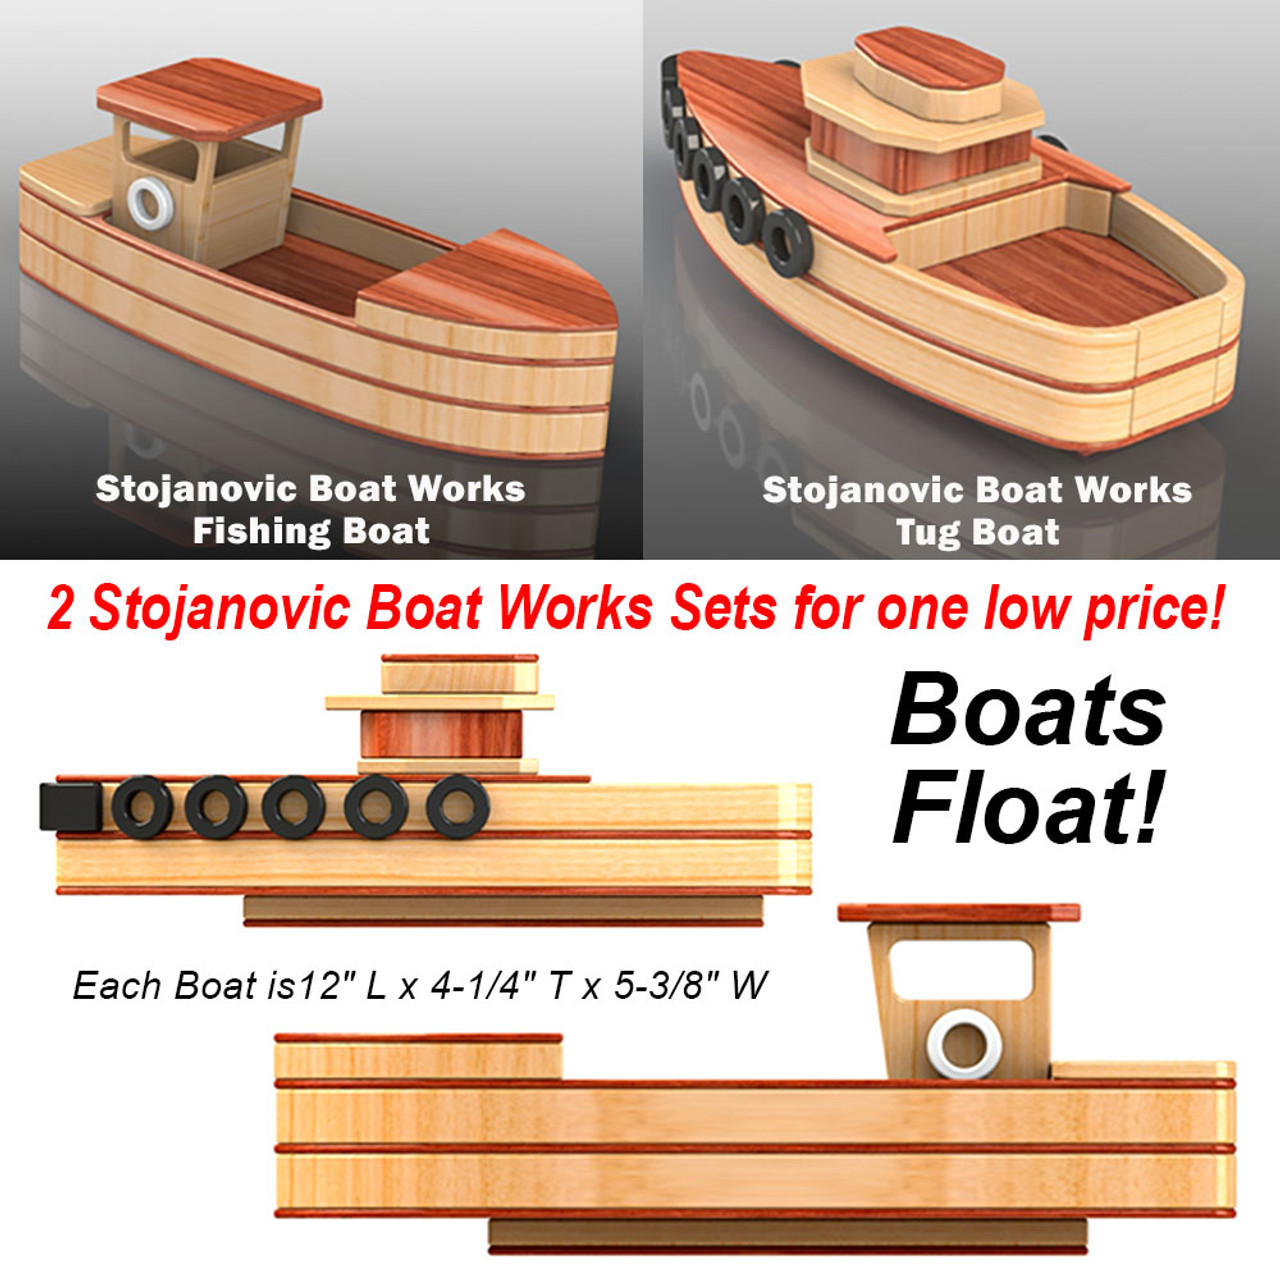 stojanovic fishing boat + tug boat wood toy plans (2 pdf downloads)